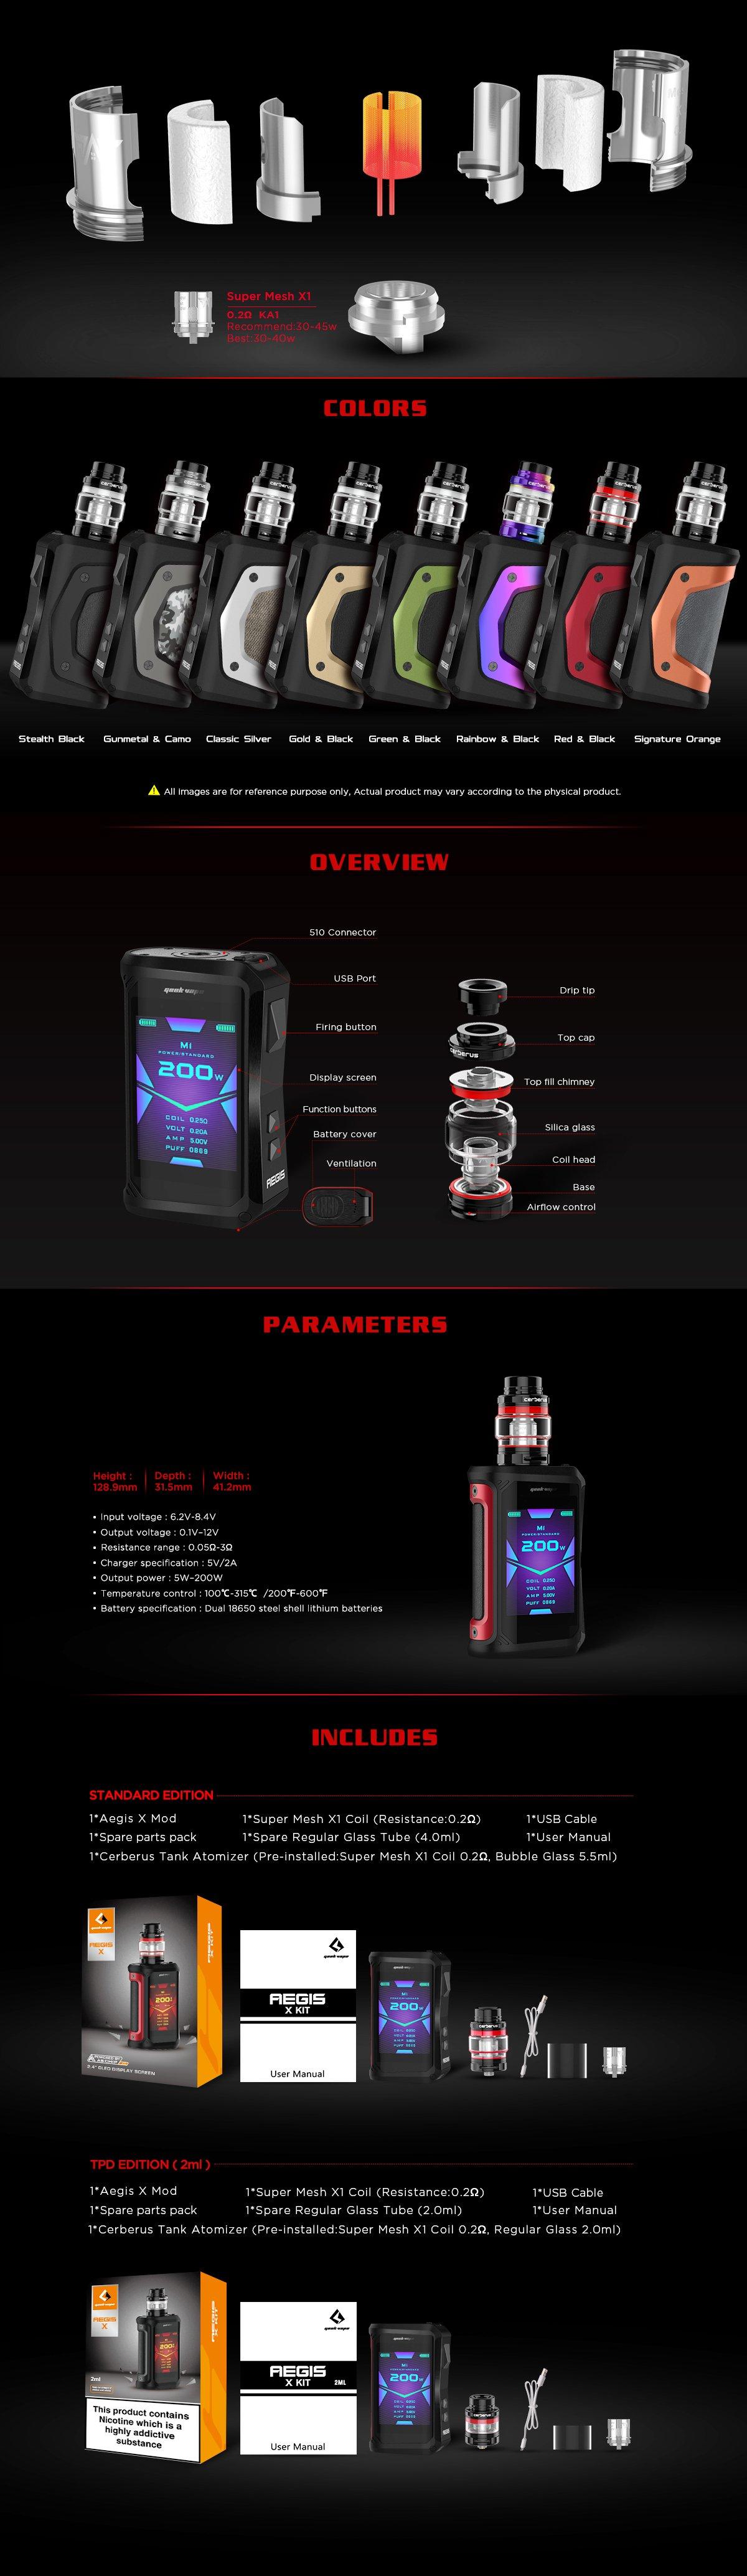 Geek Vape Aegis X Kit UK specs